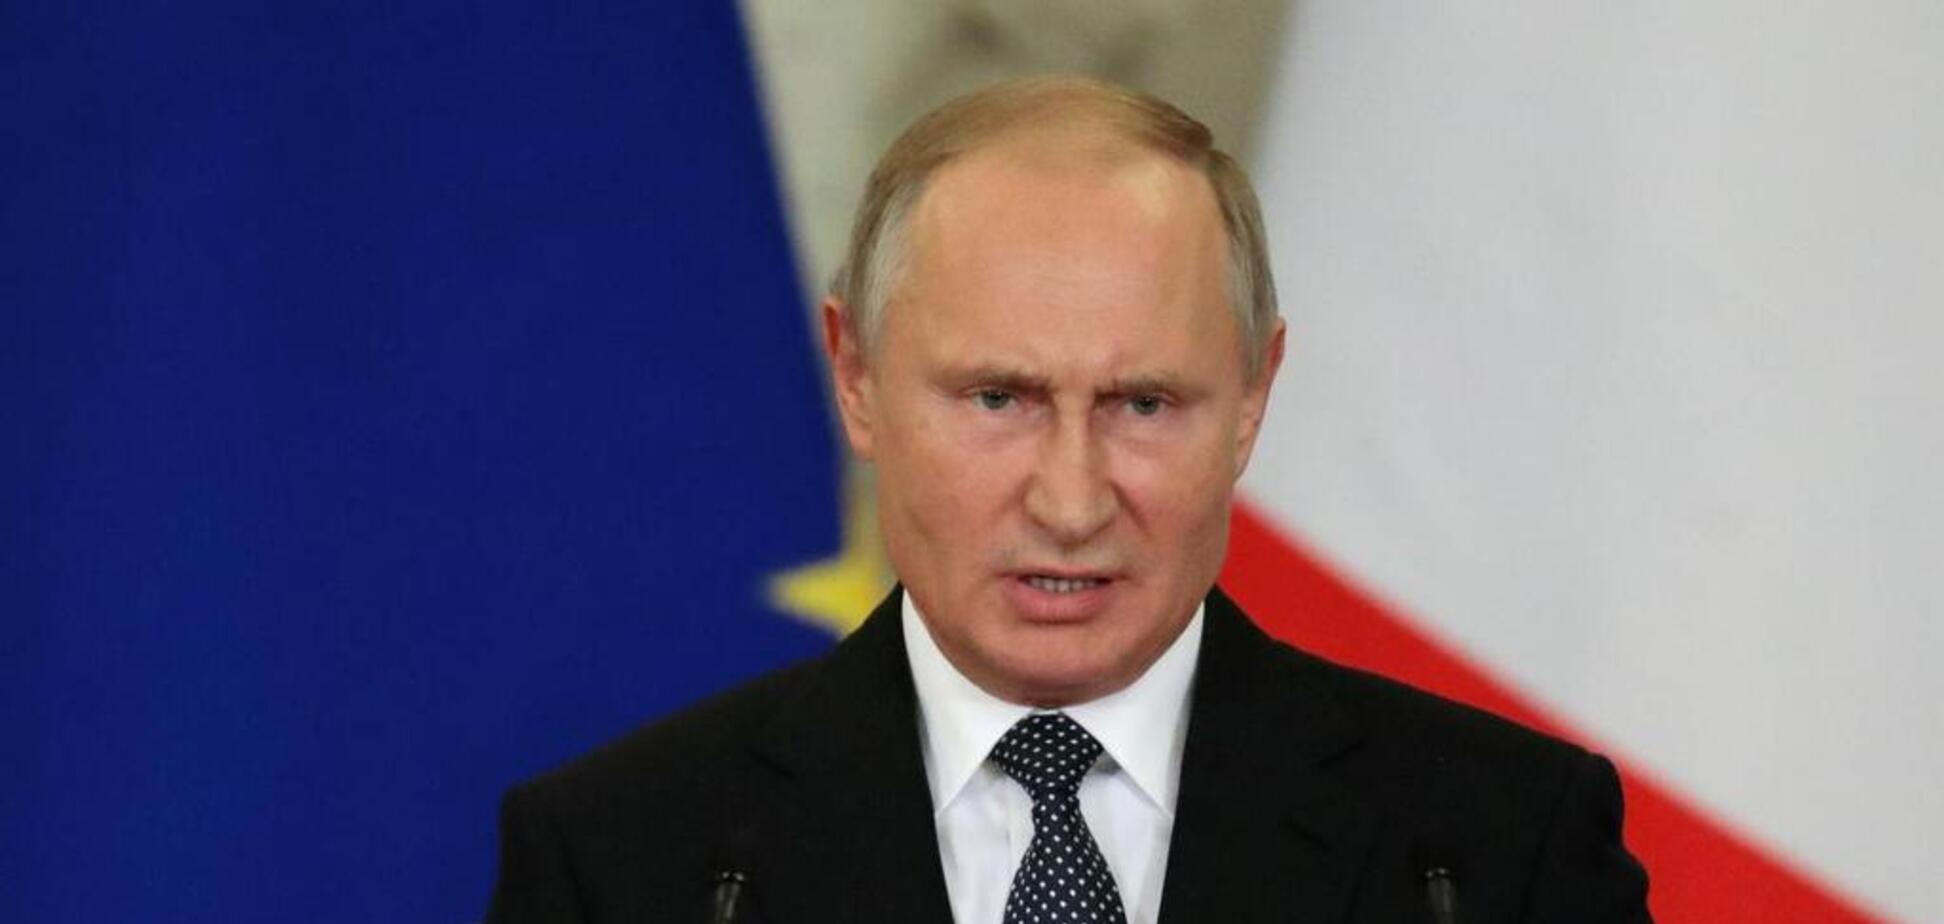 'Ты х*йло!' Украинский журналист унизил Путина на видео